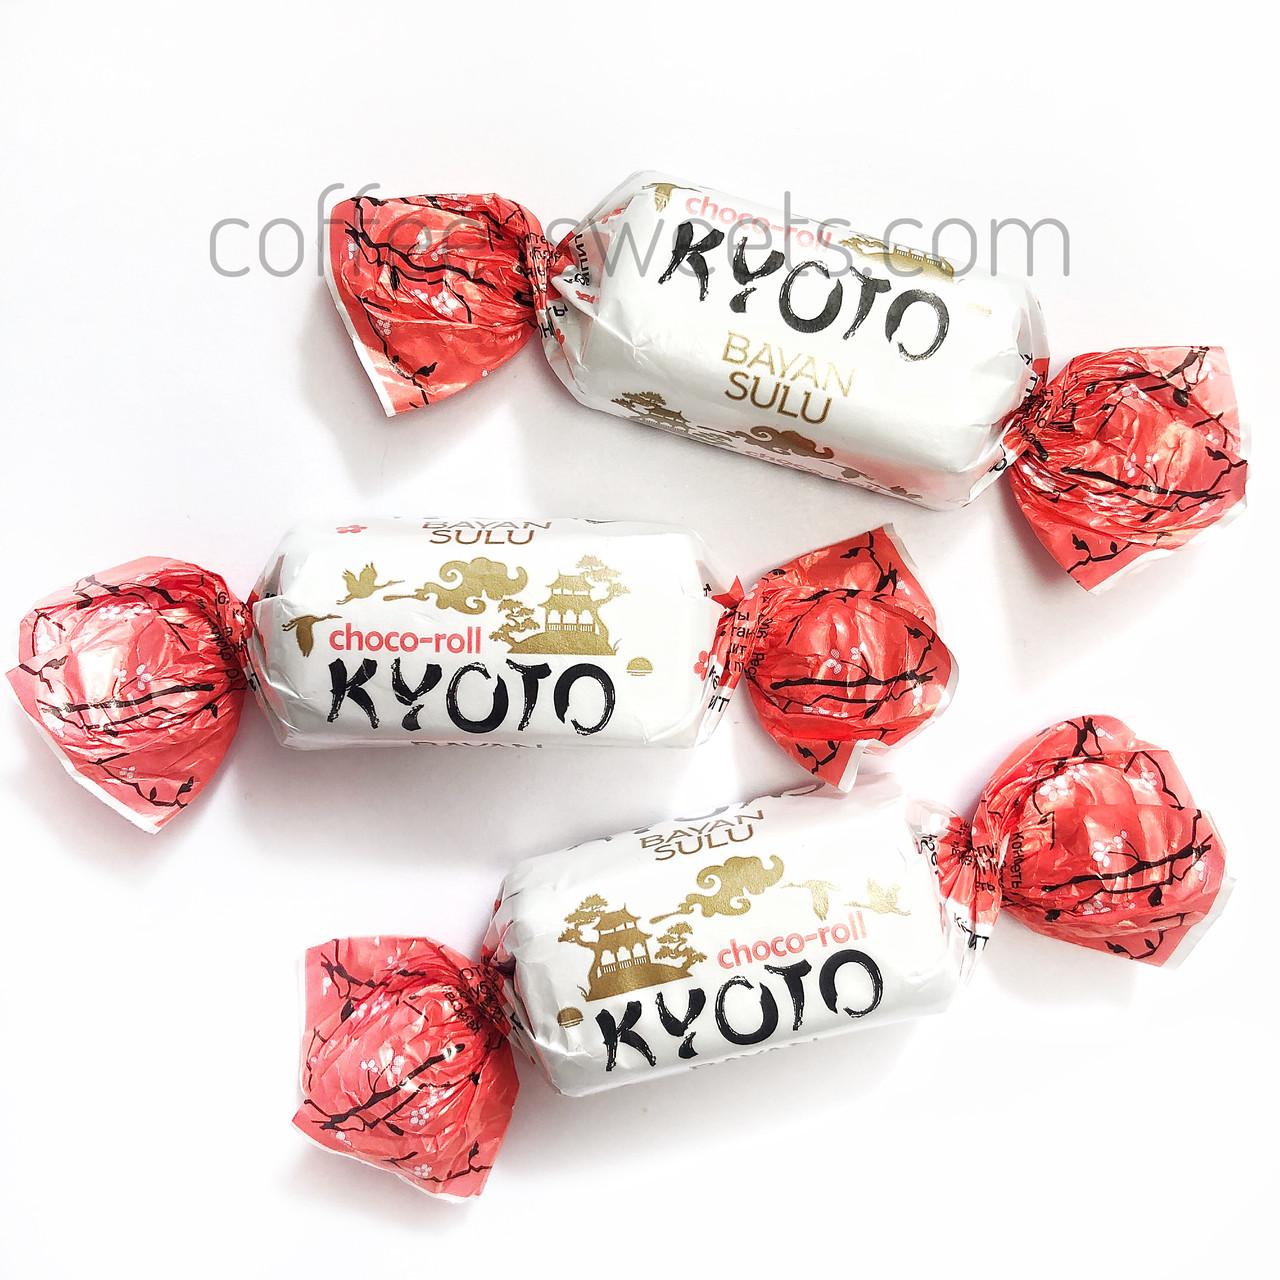 Конфеты Киото «KYOTO choco-roll» Баян Сулу